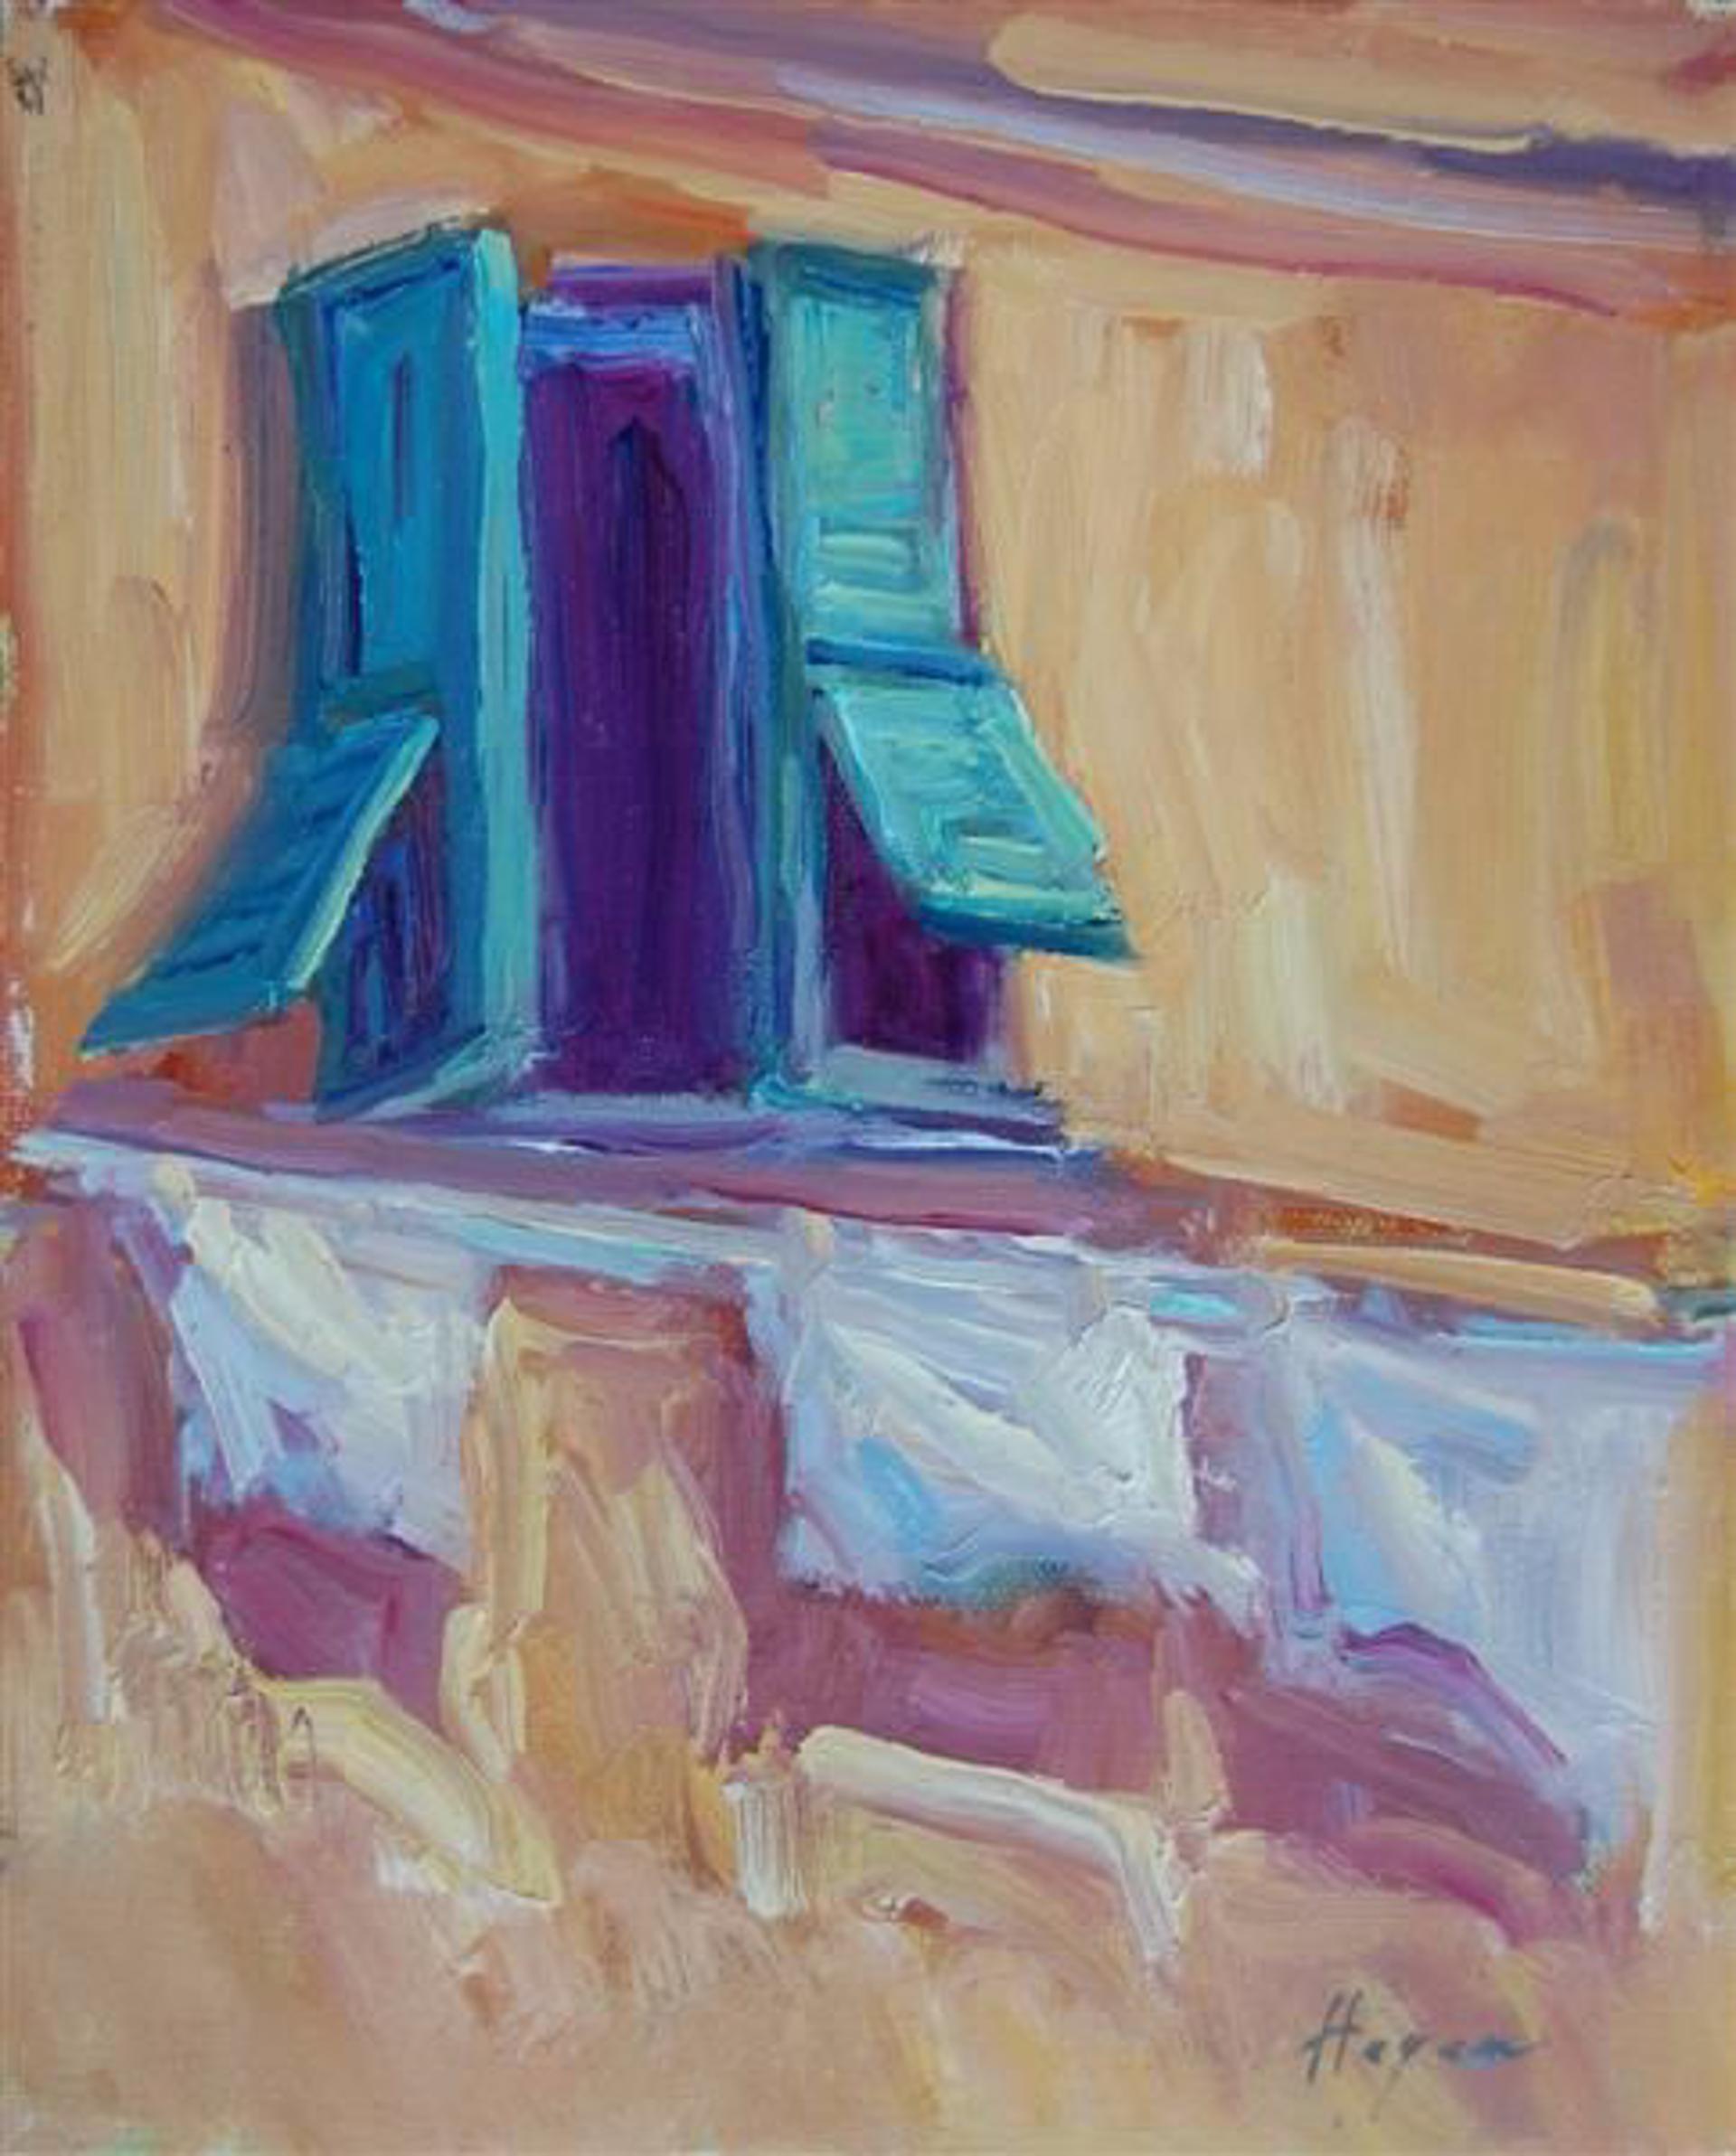 Tuscan Laundry by Karen Hewitt Hagan